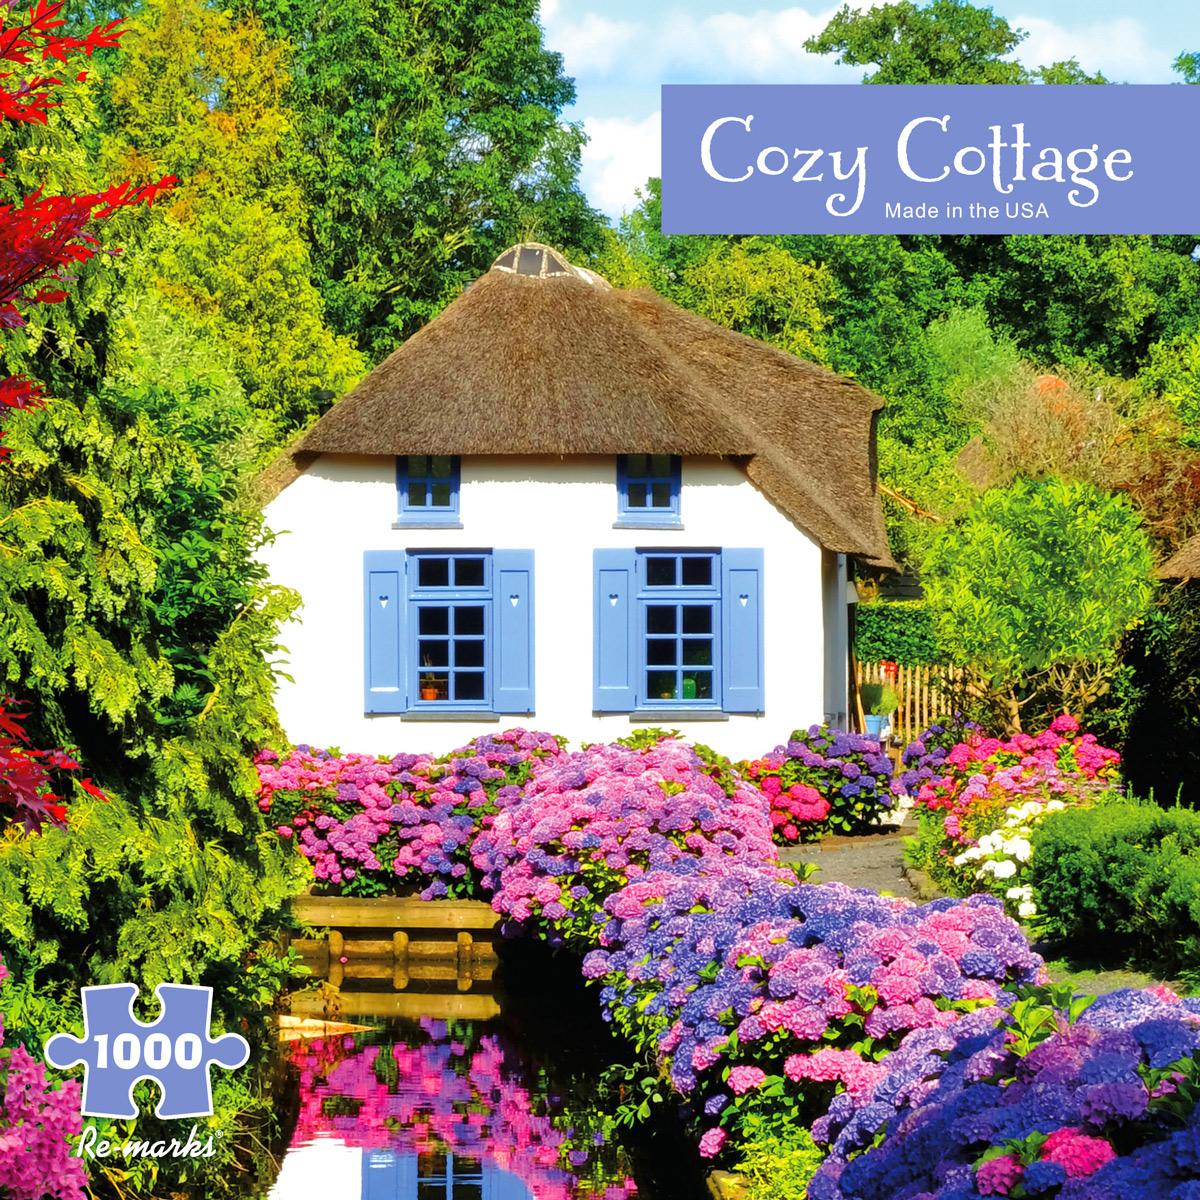 Cozy Cottage Garden Jigsaw Puzzle